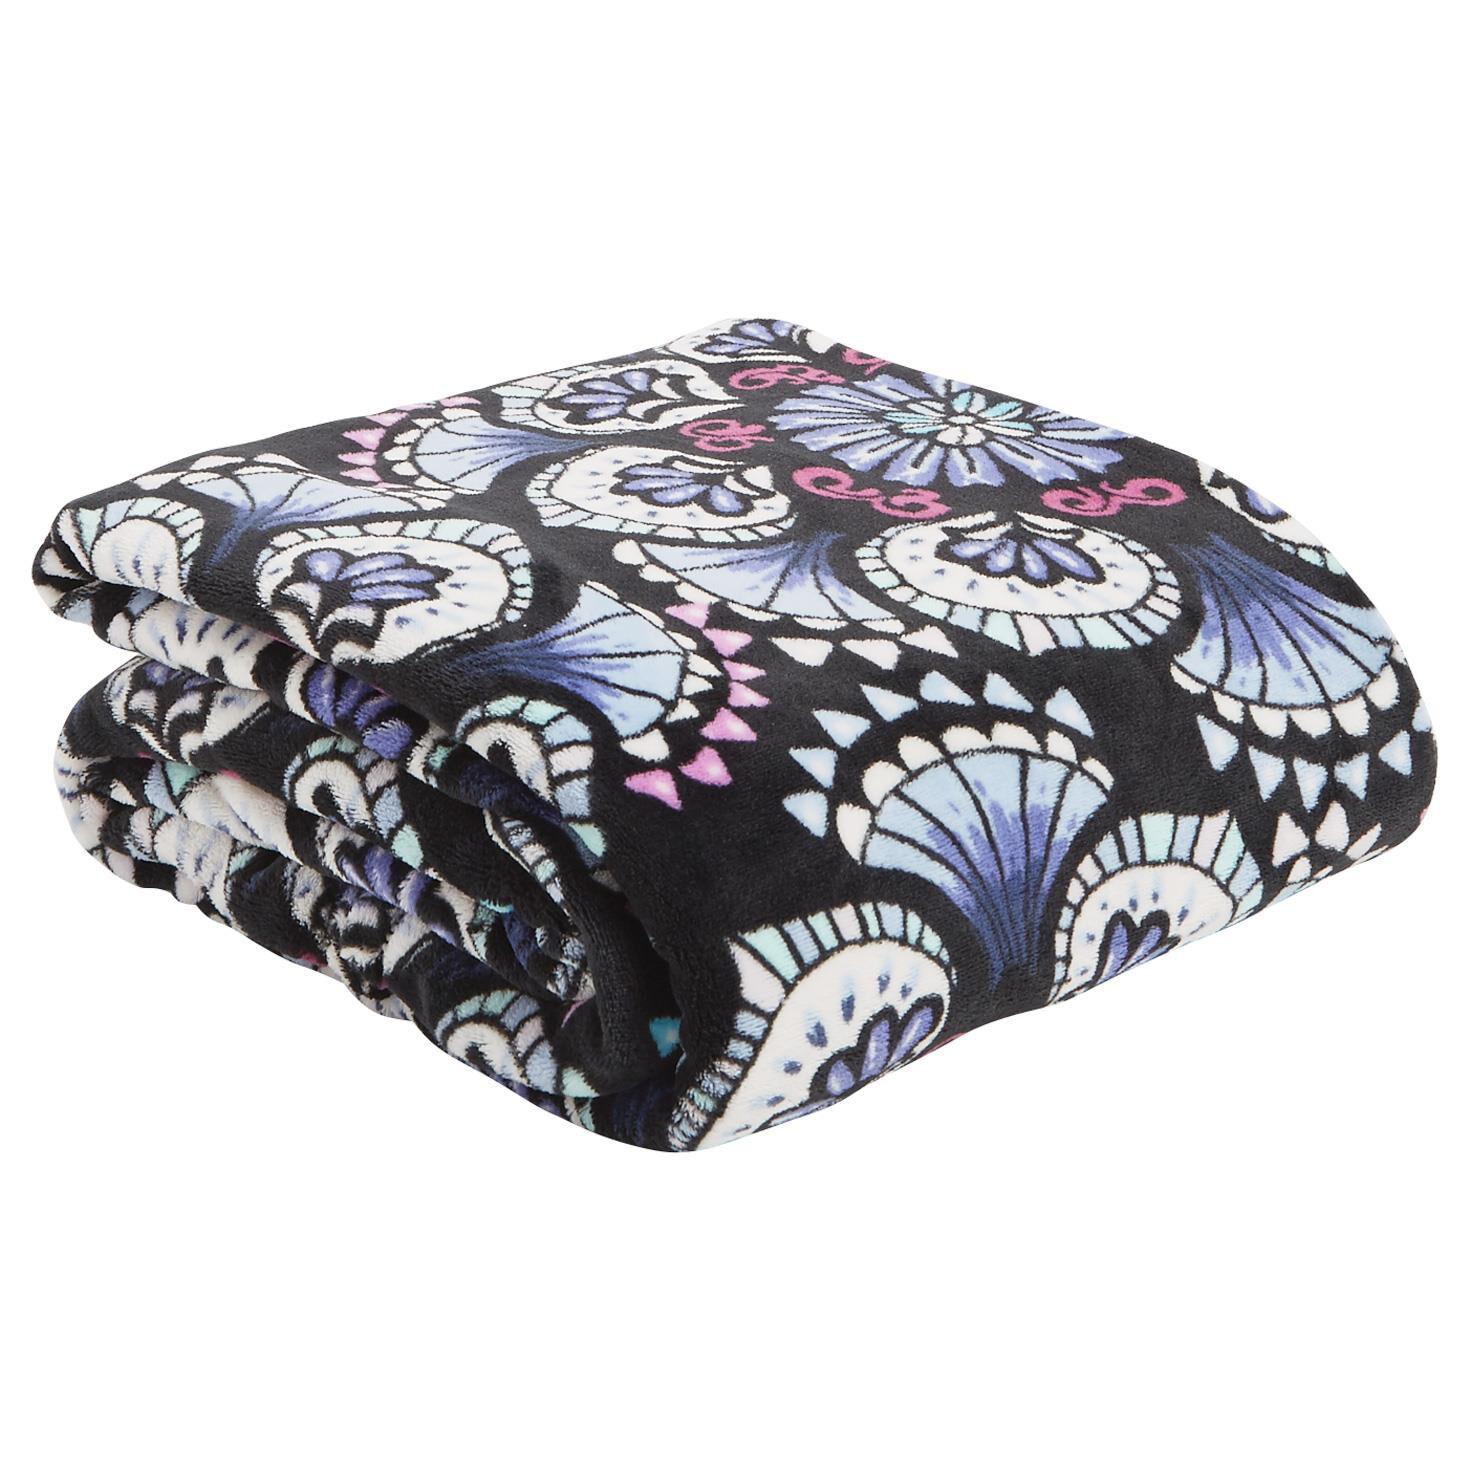 b187afb8f8f6 Vera bradley hadley backpack in classic black handbags purses jpg 512x512 Hallmark  vera bradley